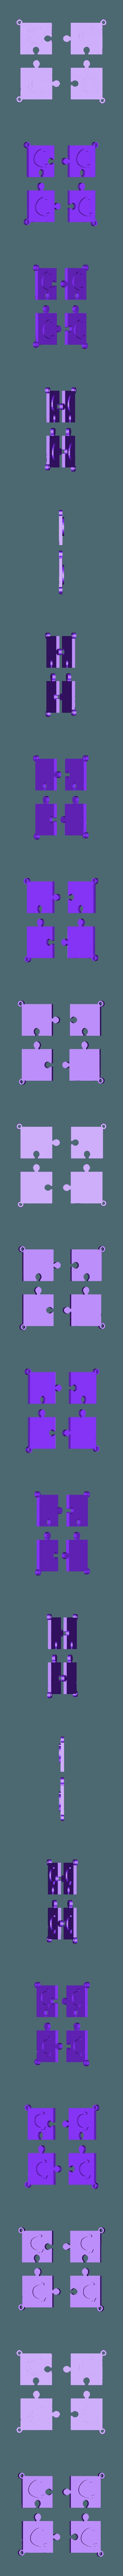 puzzle c.stl Download STL file puzzle key ring • 3D printing design, catf3d